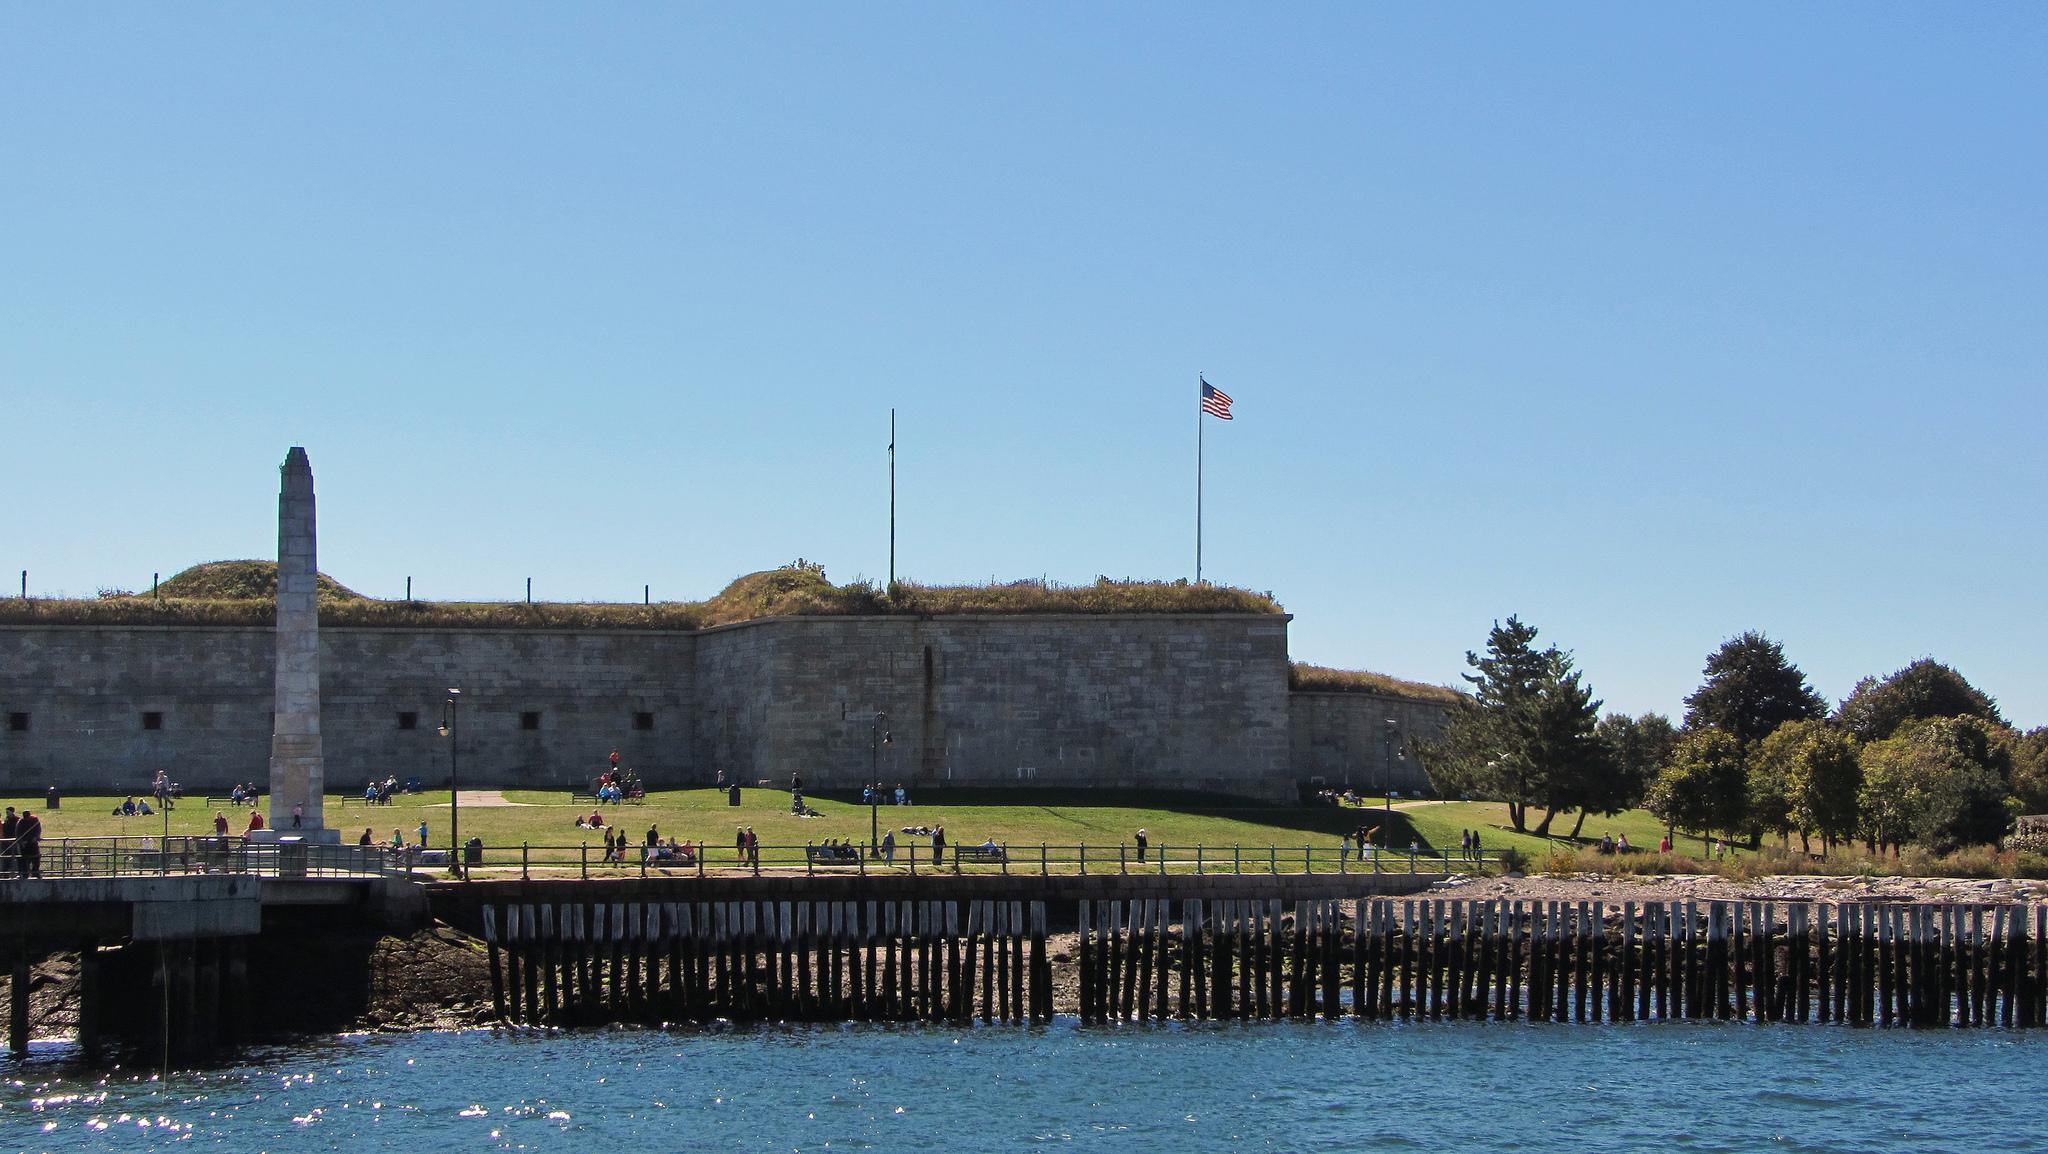 Castle Island Park